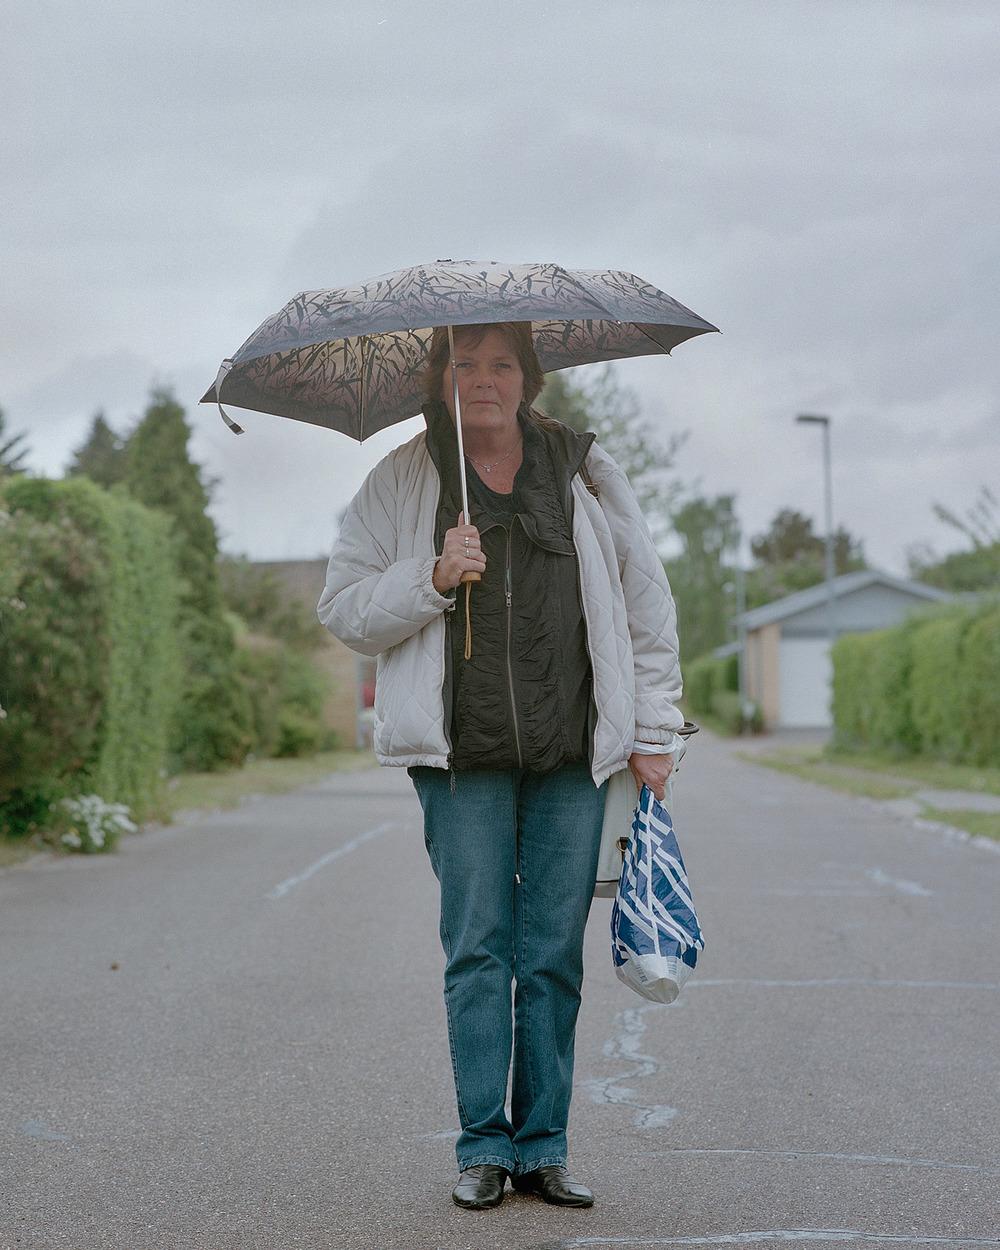 dame-paraply_2.jpg